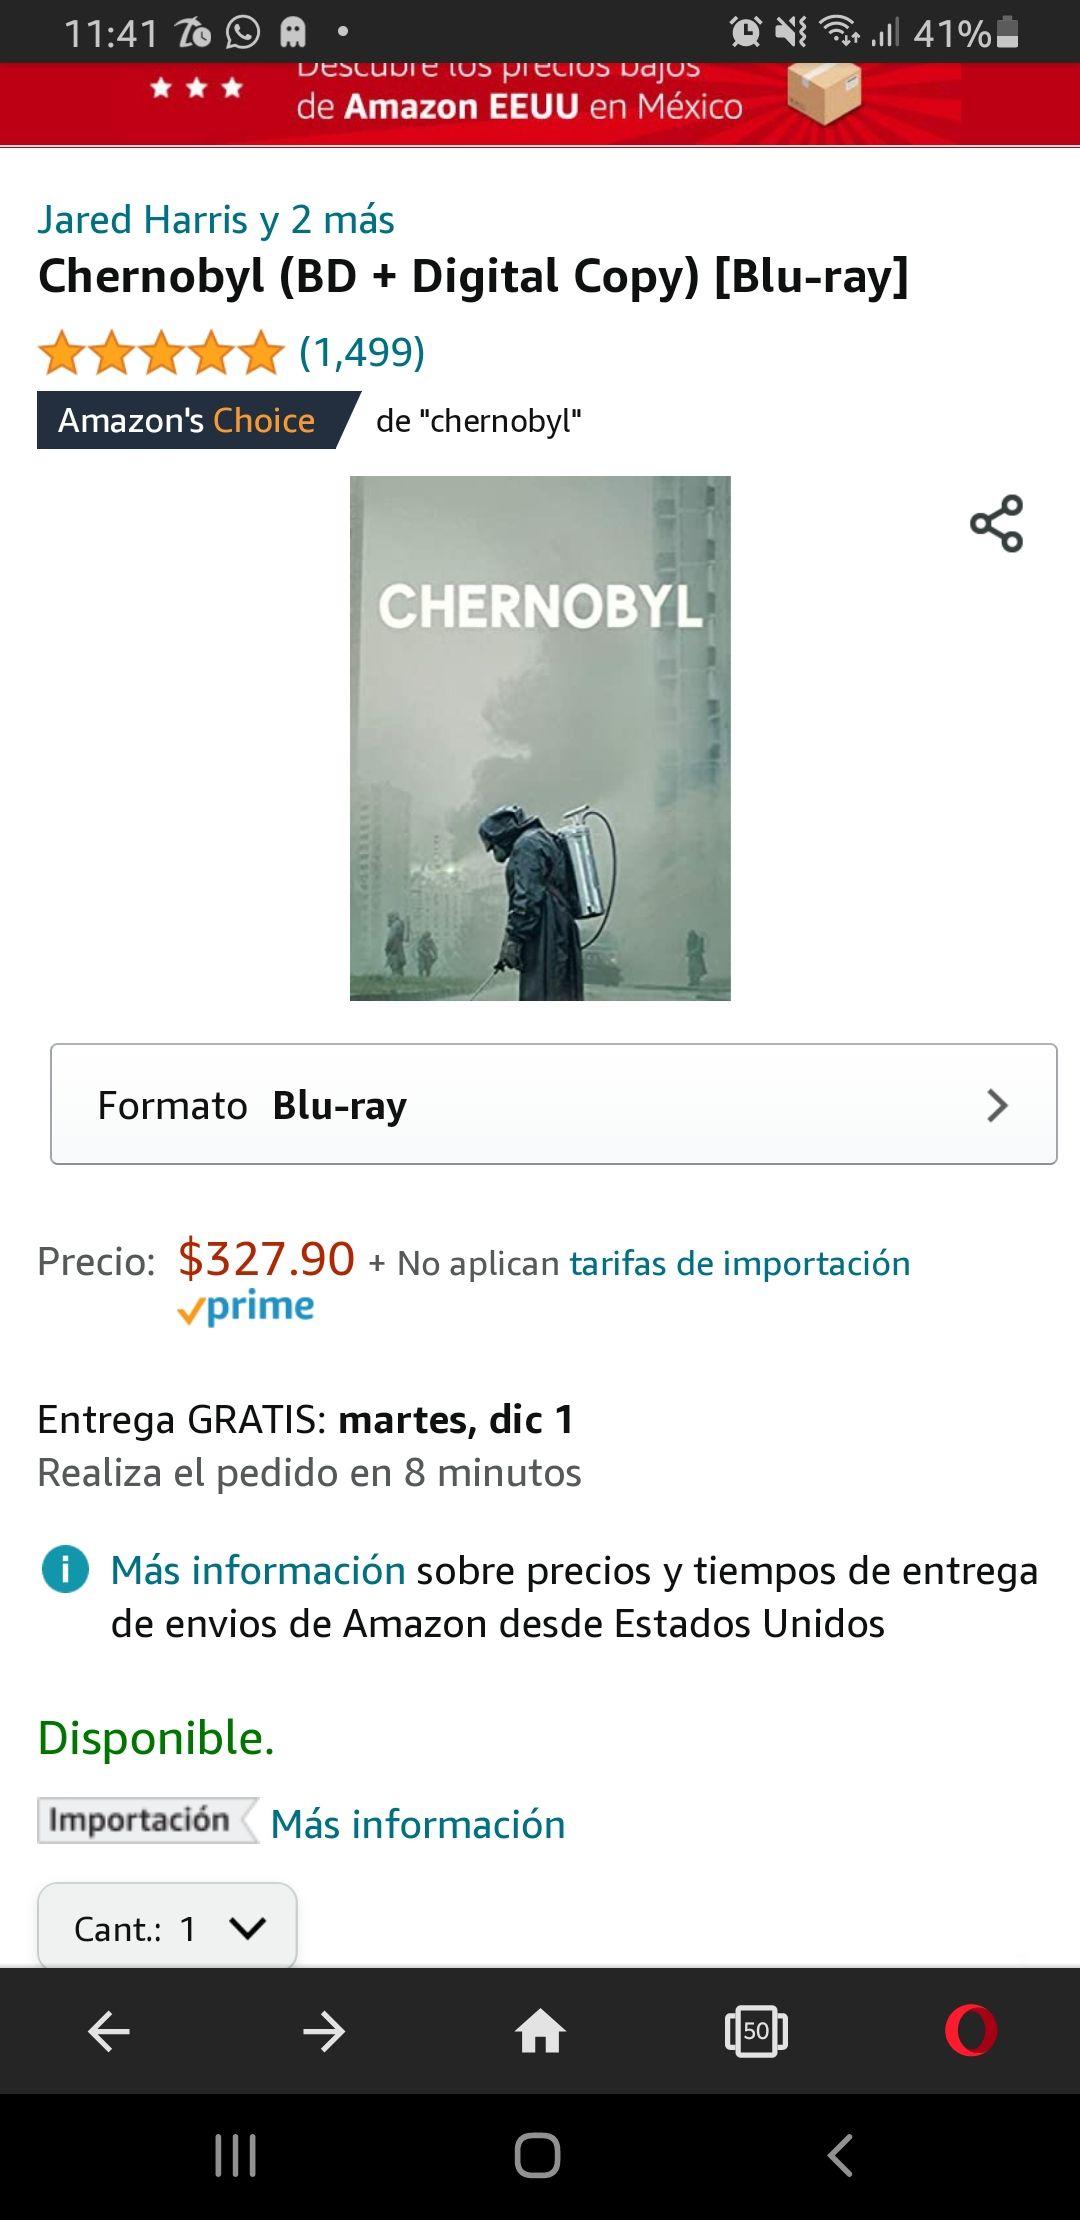 Amazon MX: Chernobyl bluray y copia digital